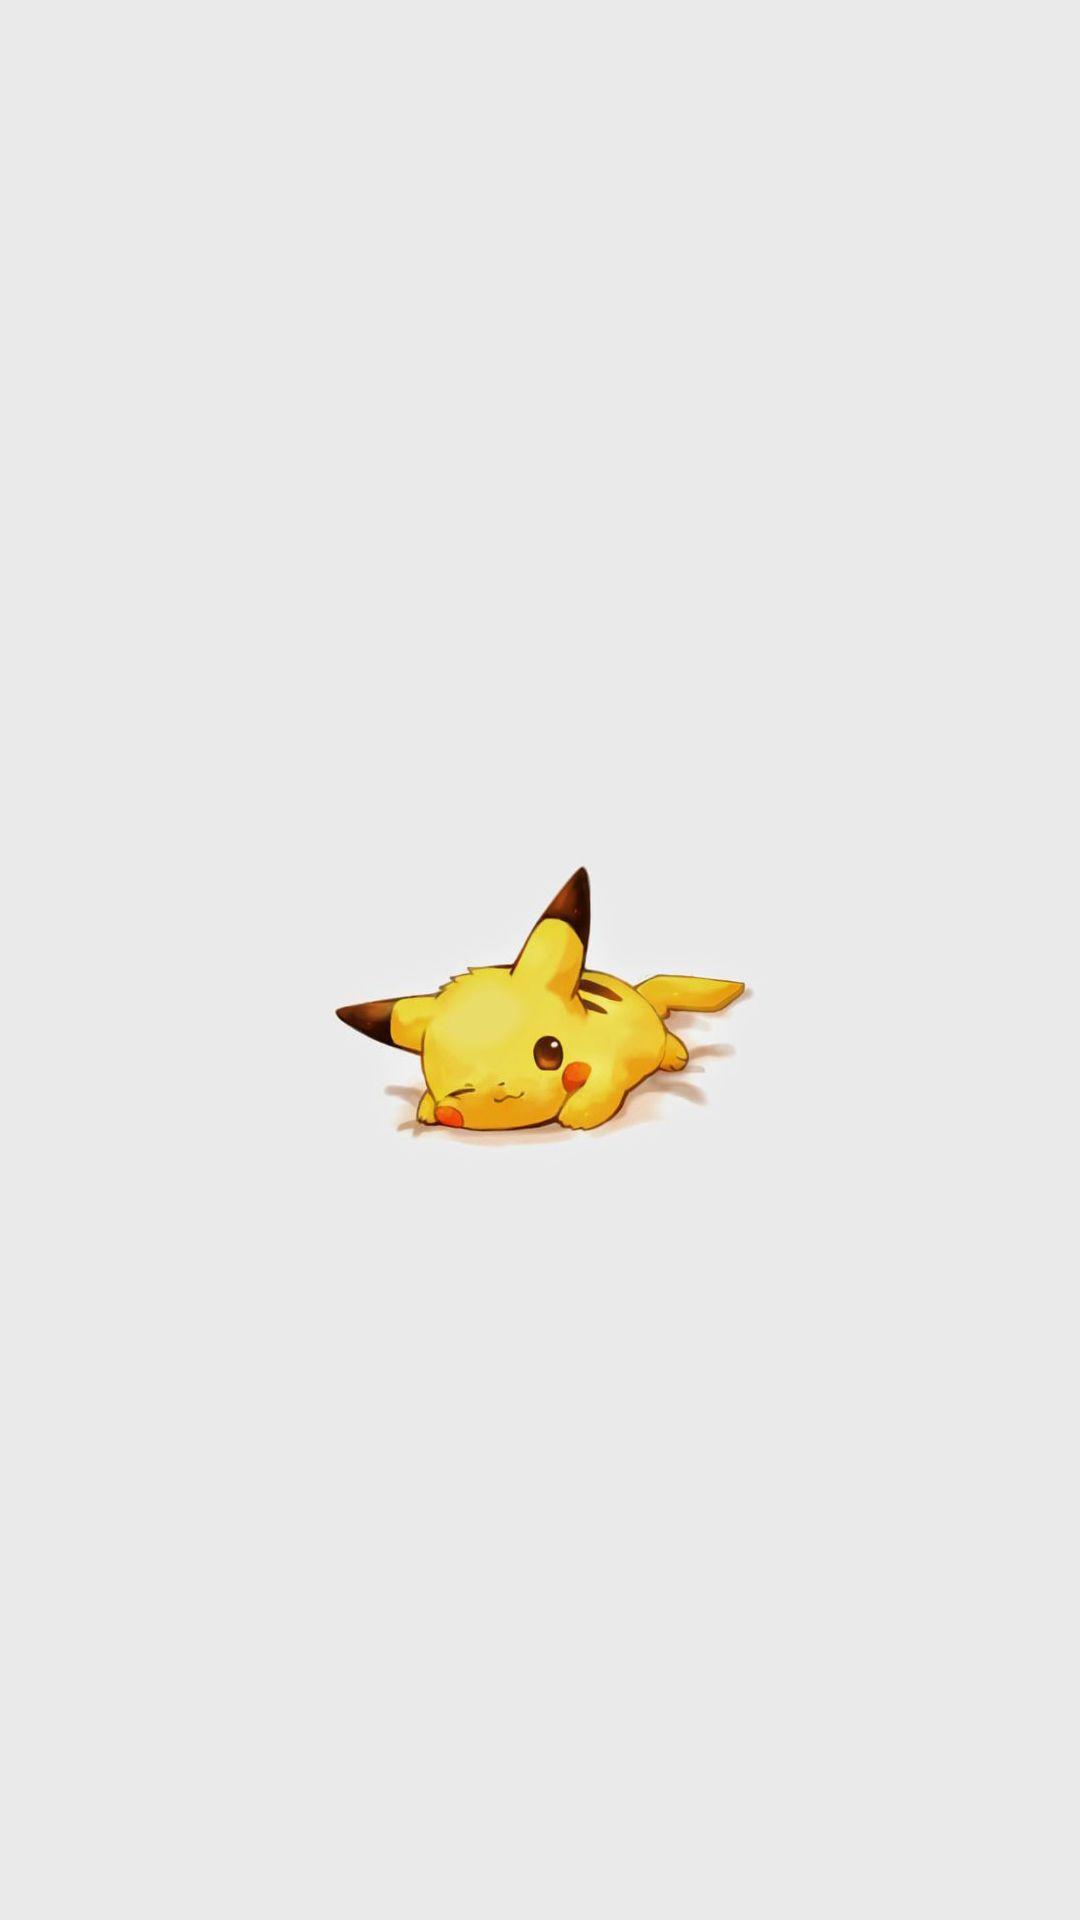 Pokemon Cool iOS 9 wallpaper